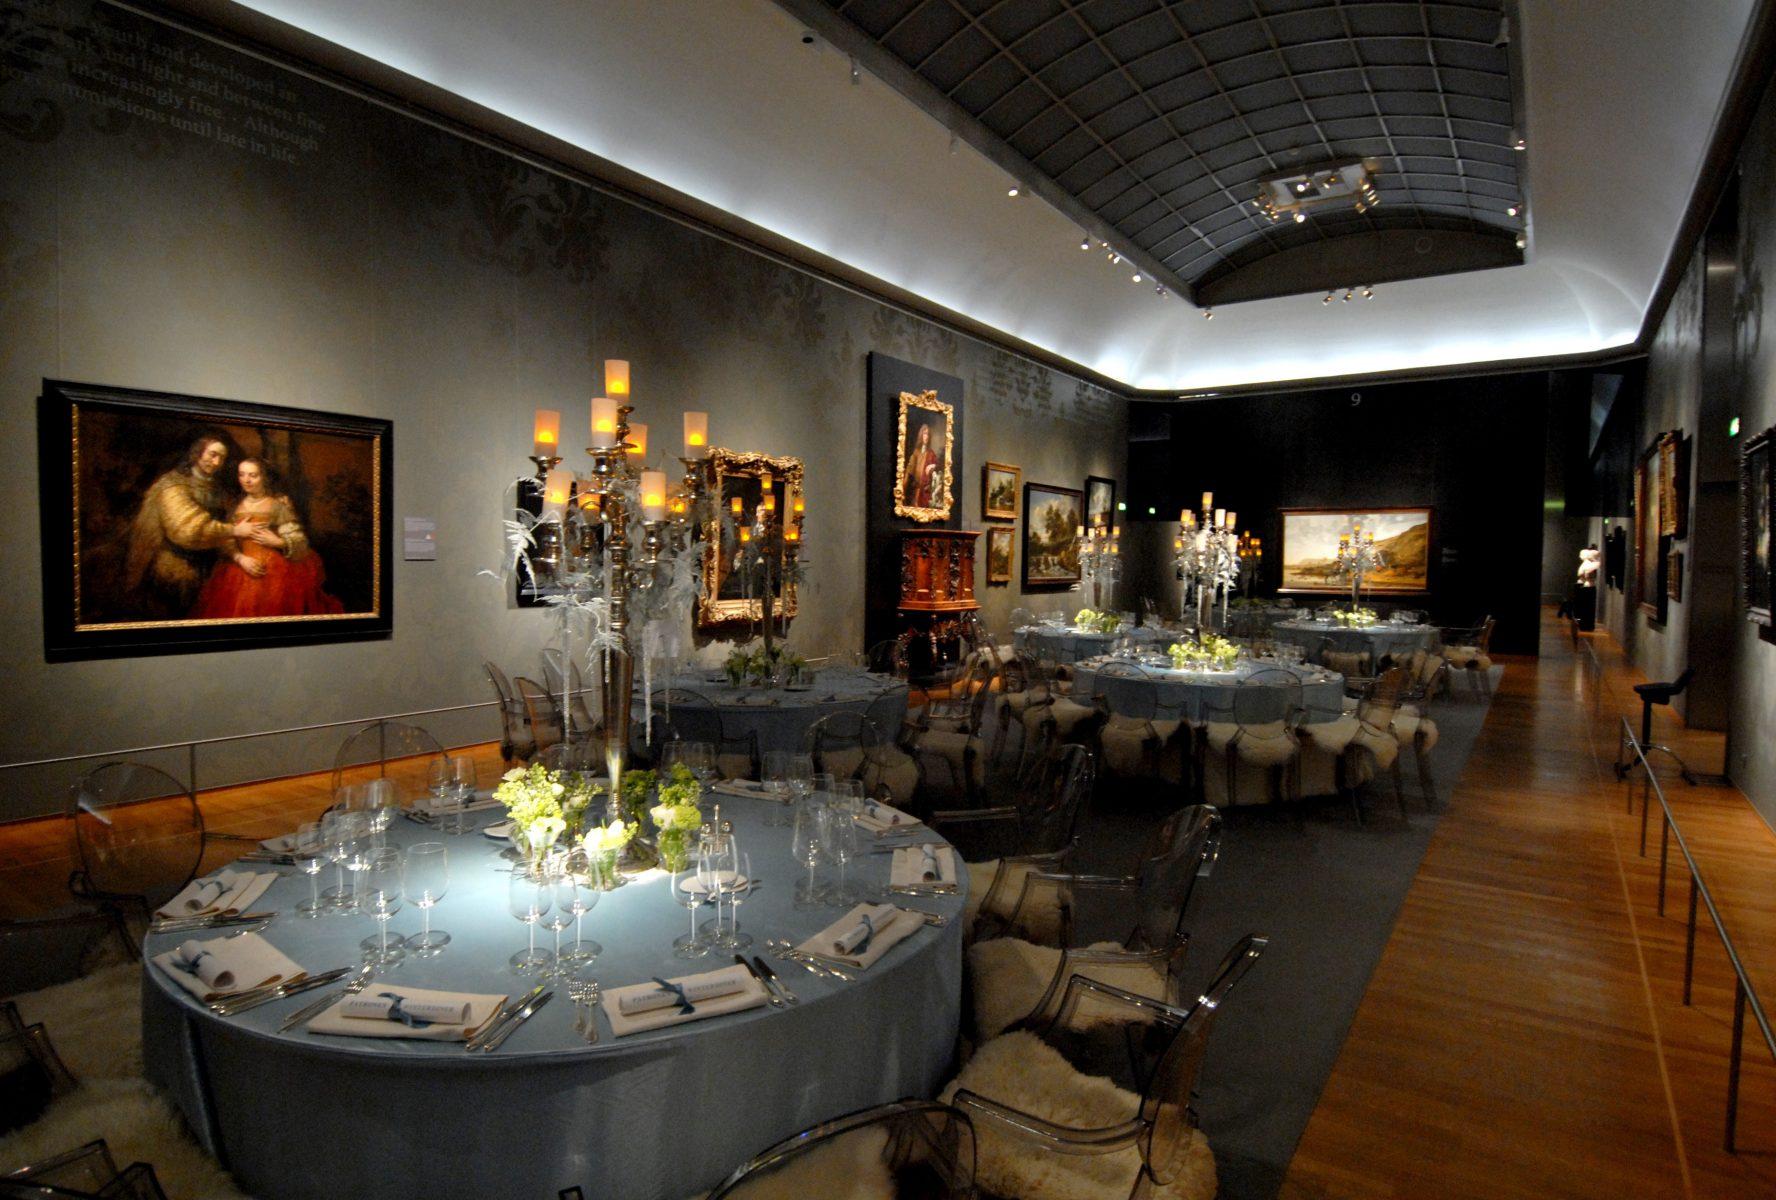 Dinner im Museum (Bas de Boer - Eventstyling)